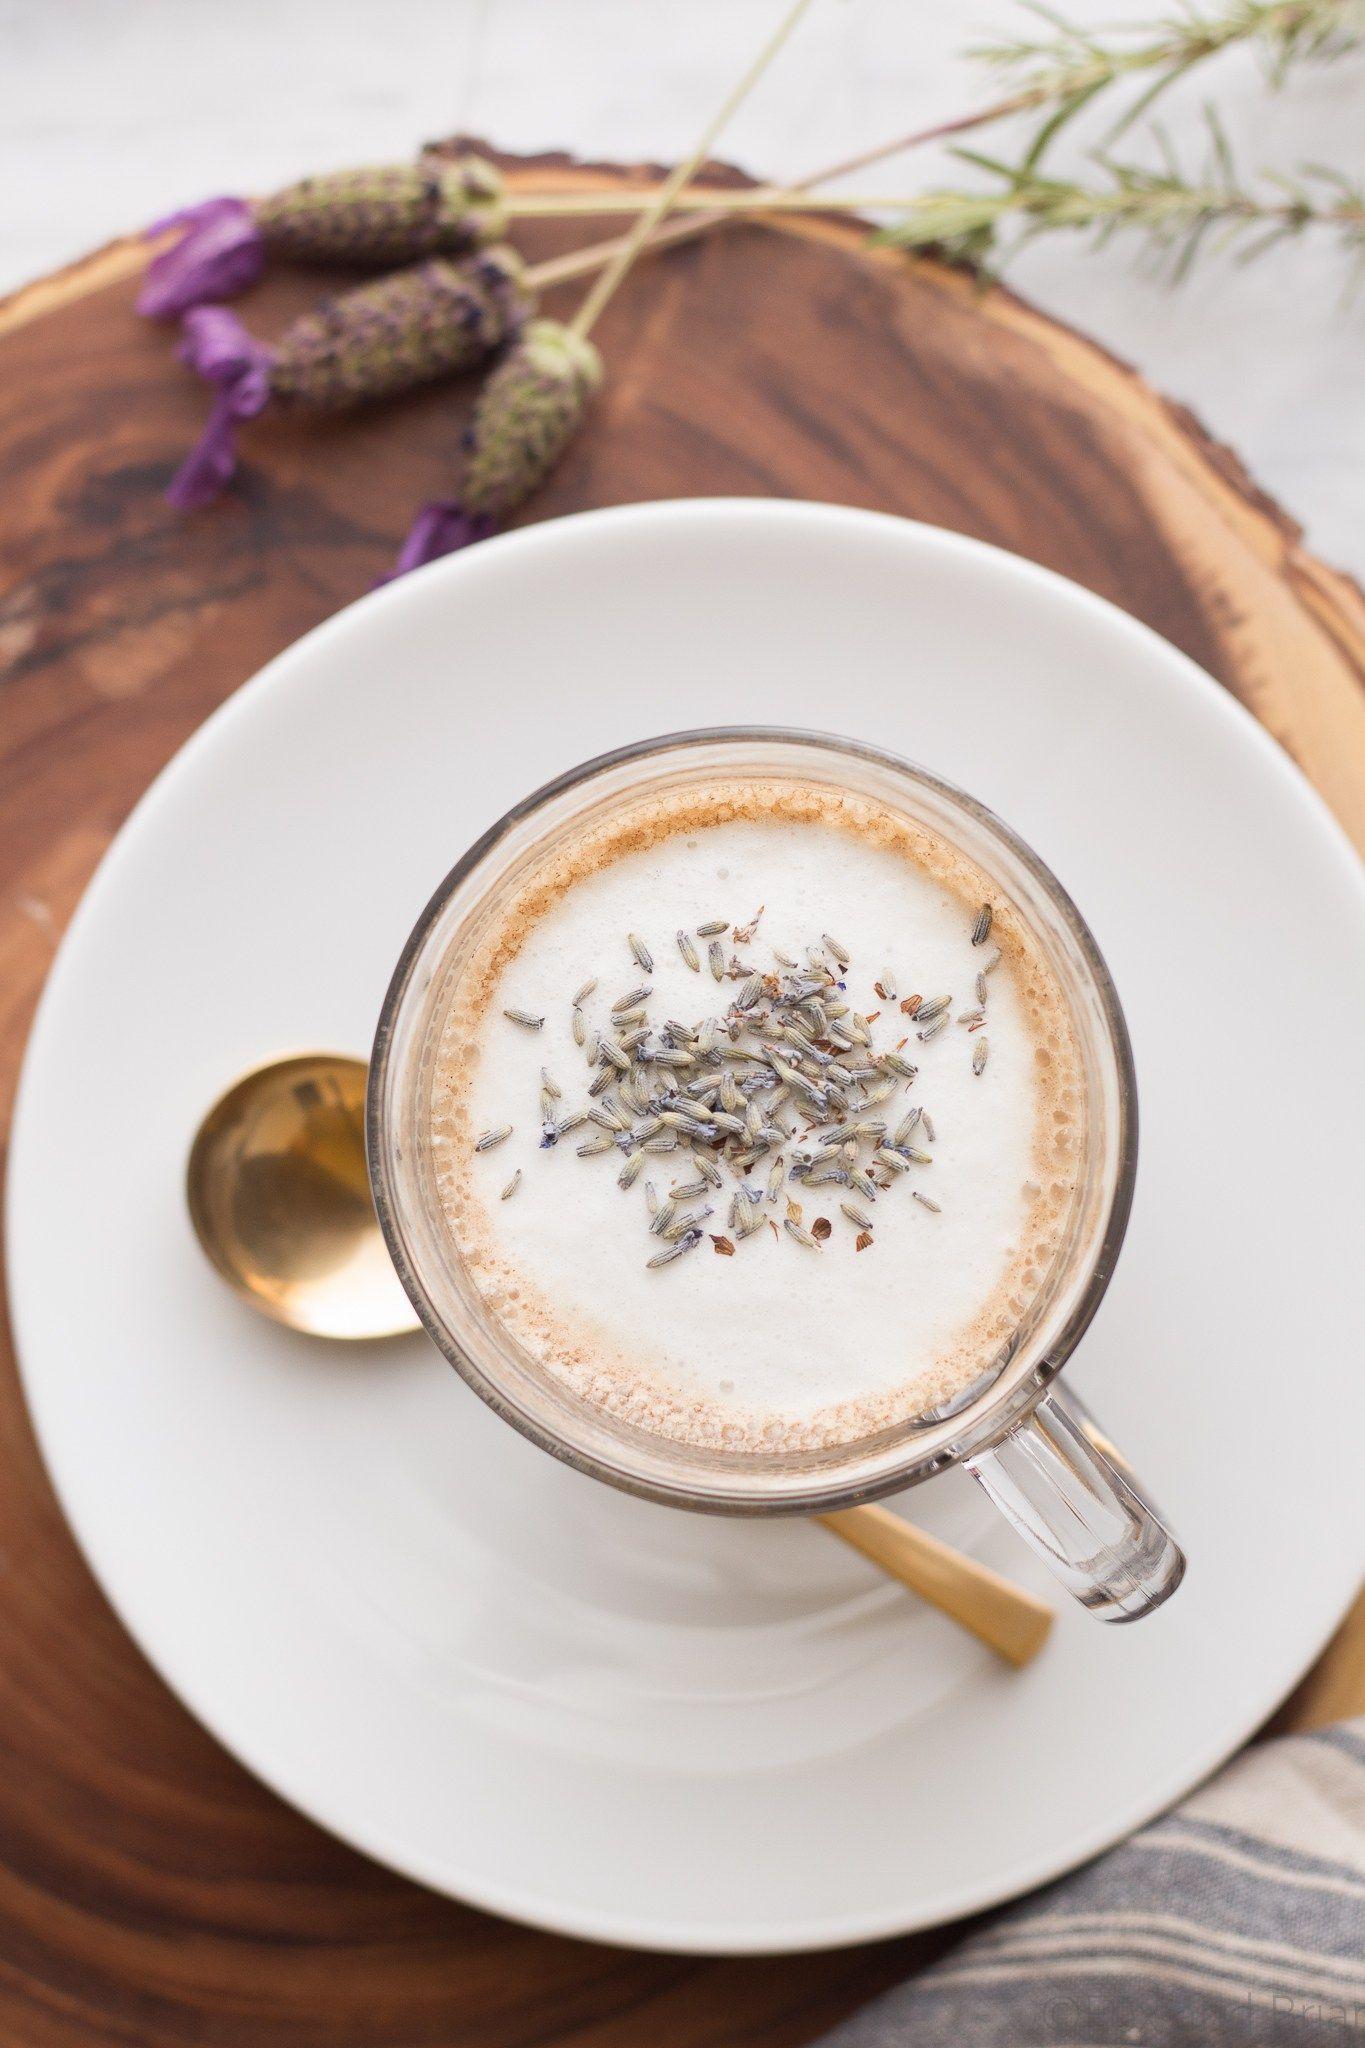 Incredible Unique Ideas Coffee Menu Watches coffee